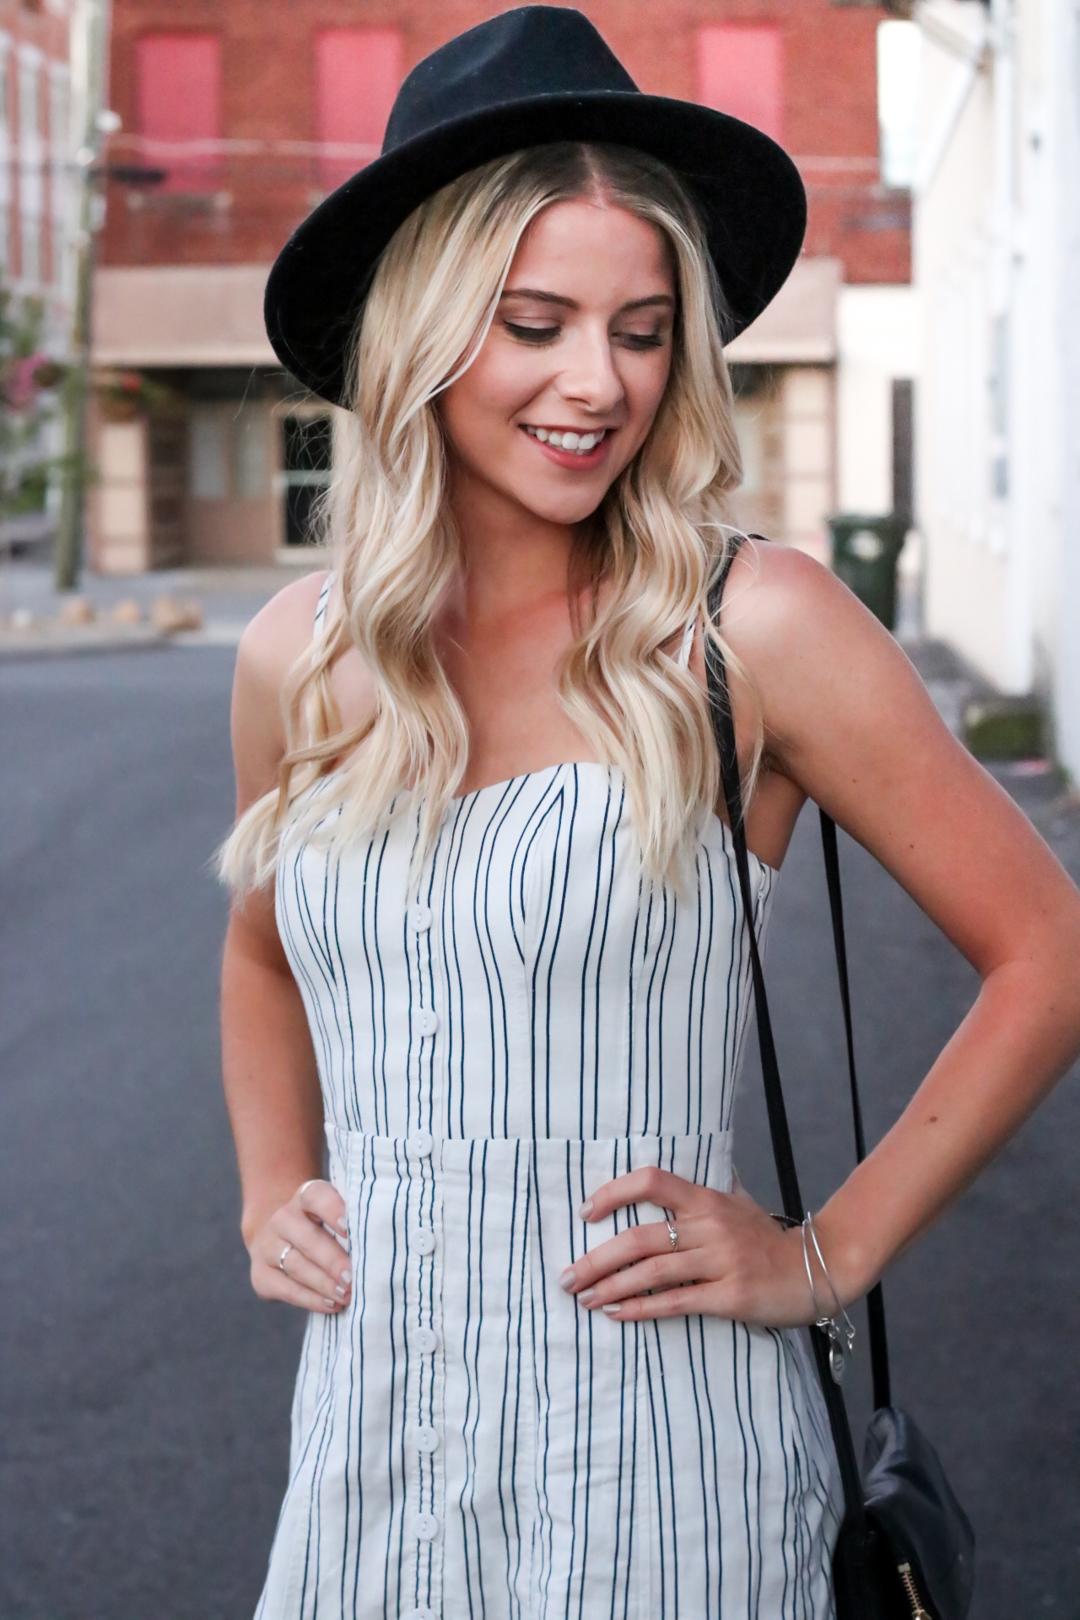 Striped Urban Outfitters Mini Dress-8.jpg